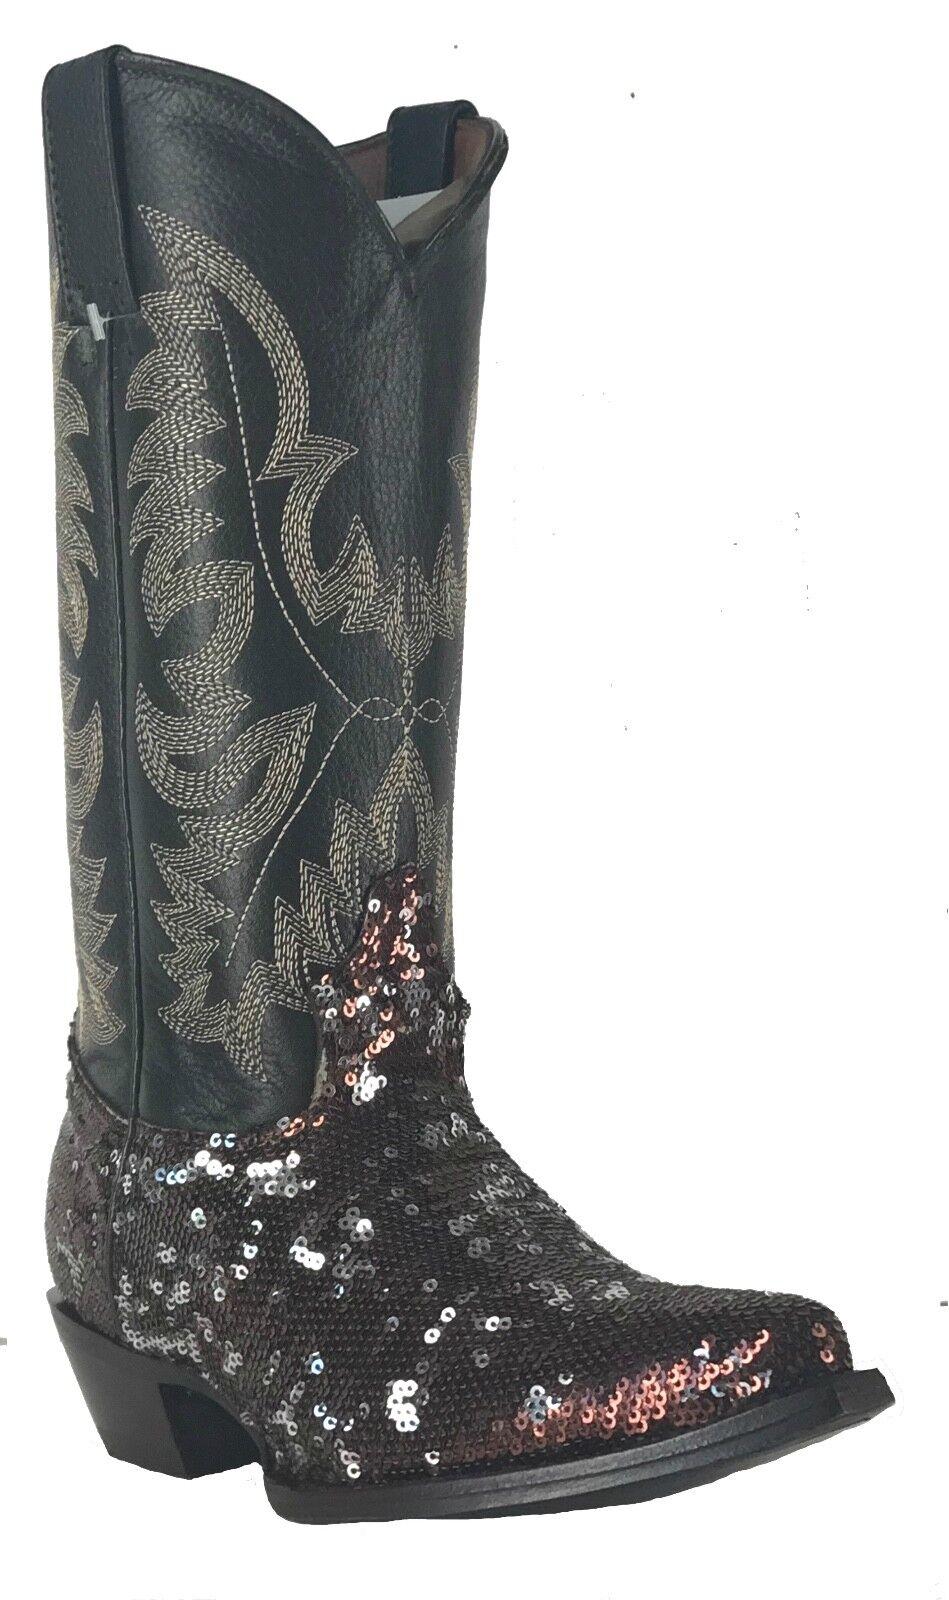 Women's Fantastical Shimmering Sequin Western Cowgirl Biker Boots Snip Brown